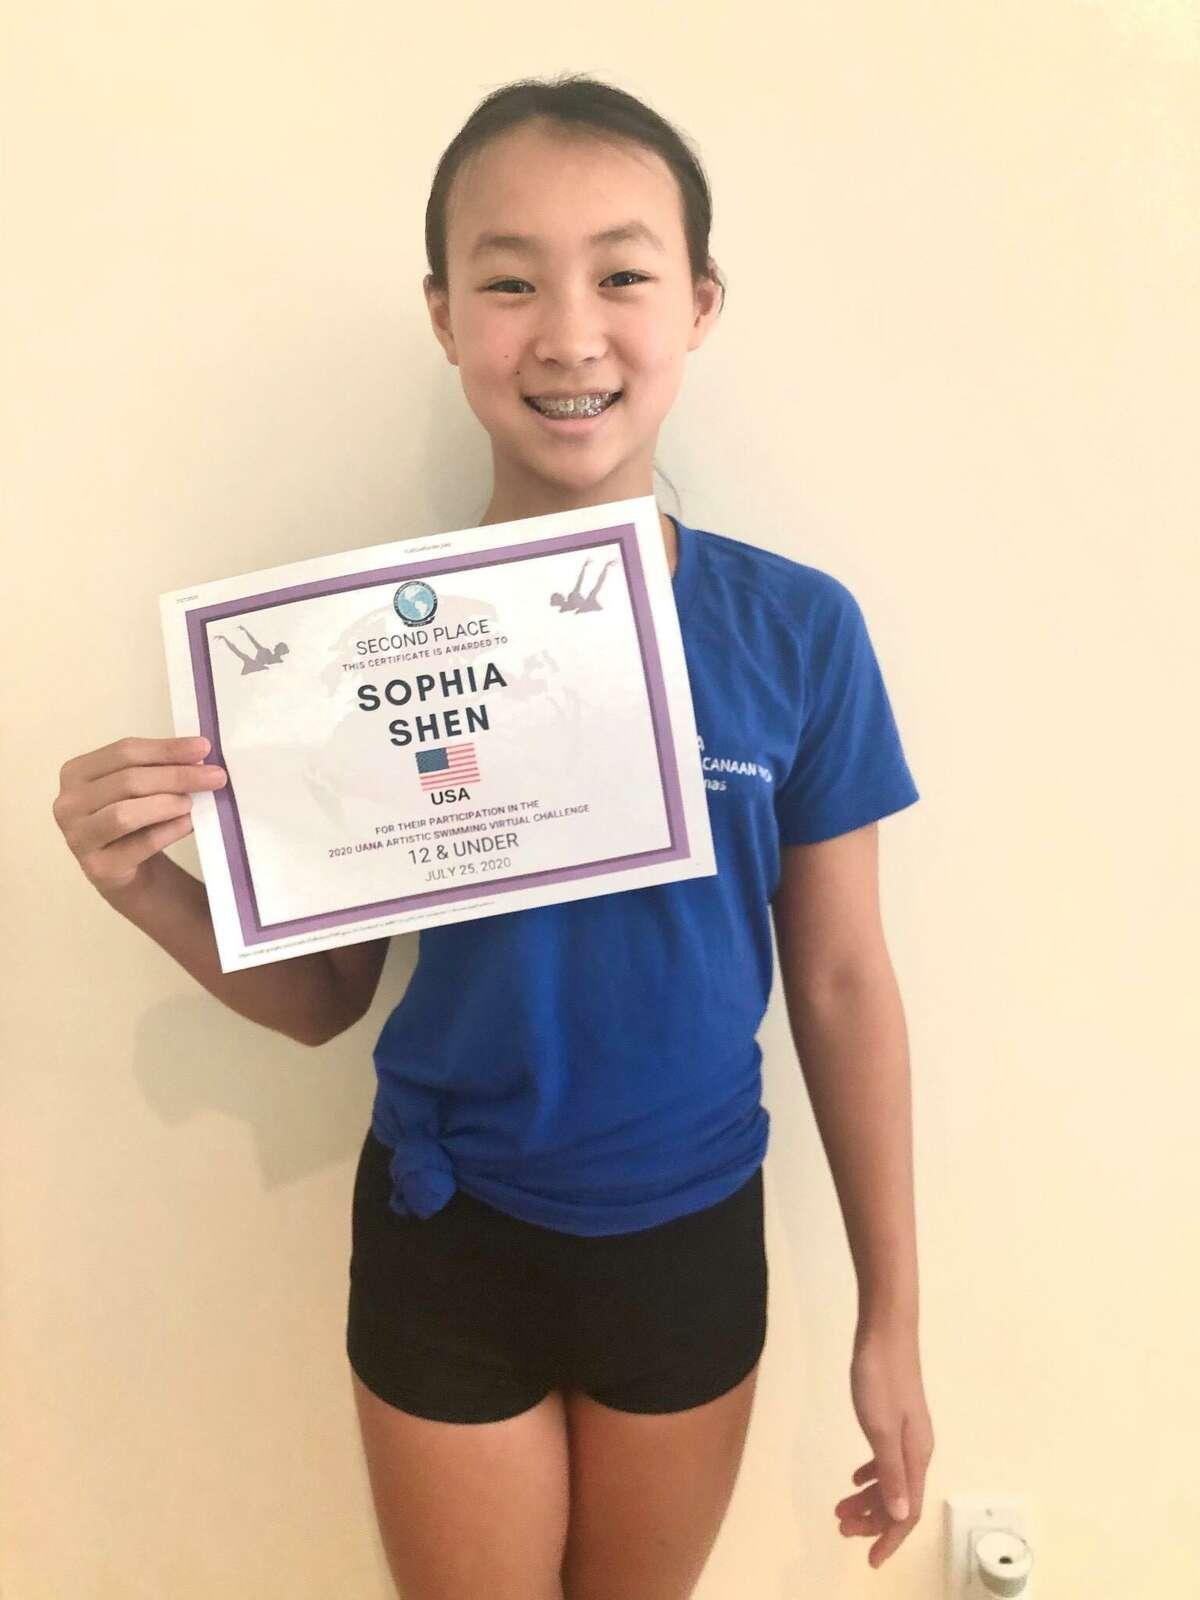 Sophia Shen, New Canaan YMCA's Aquianas synchronized swimmer